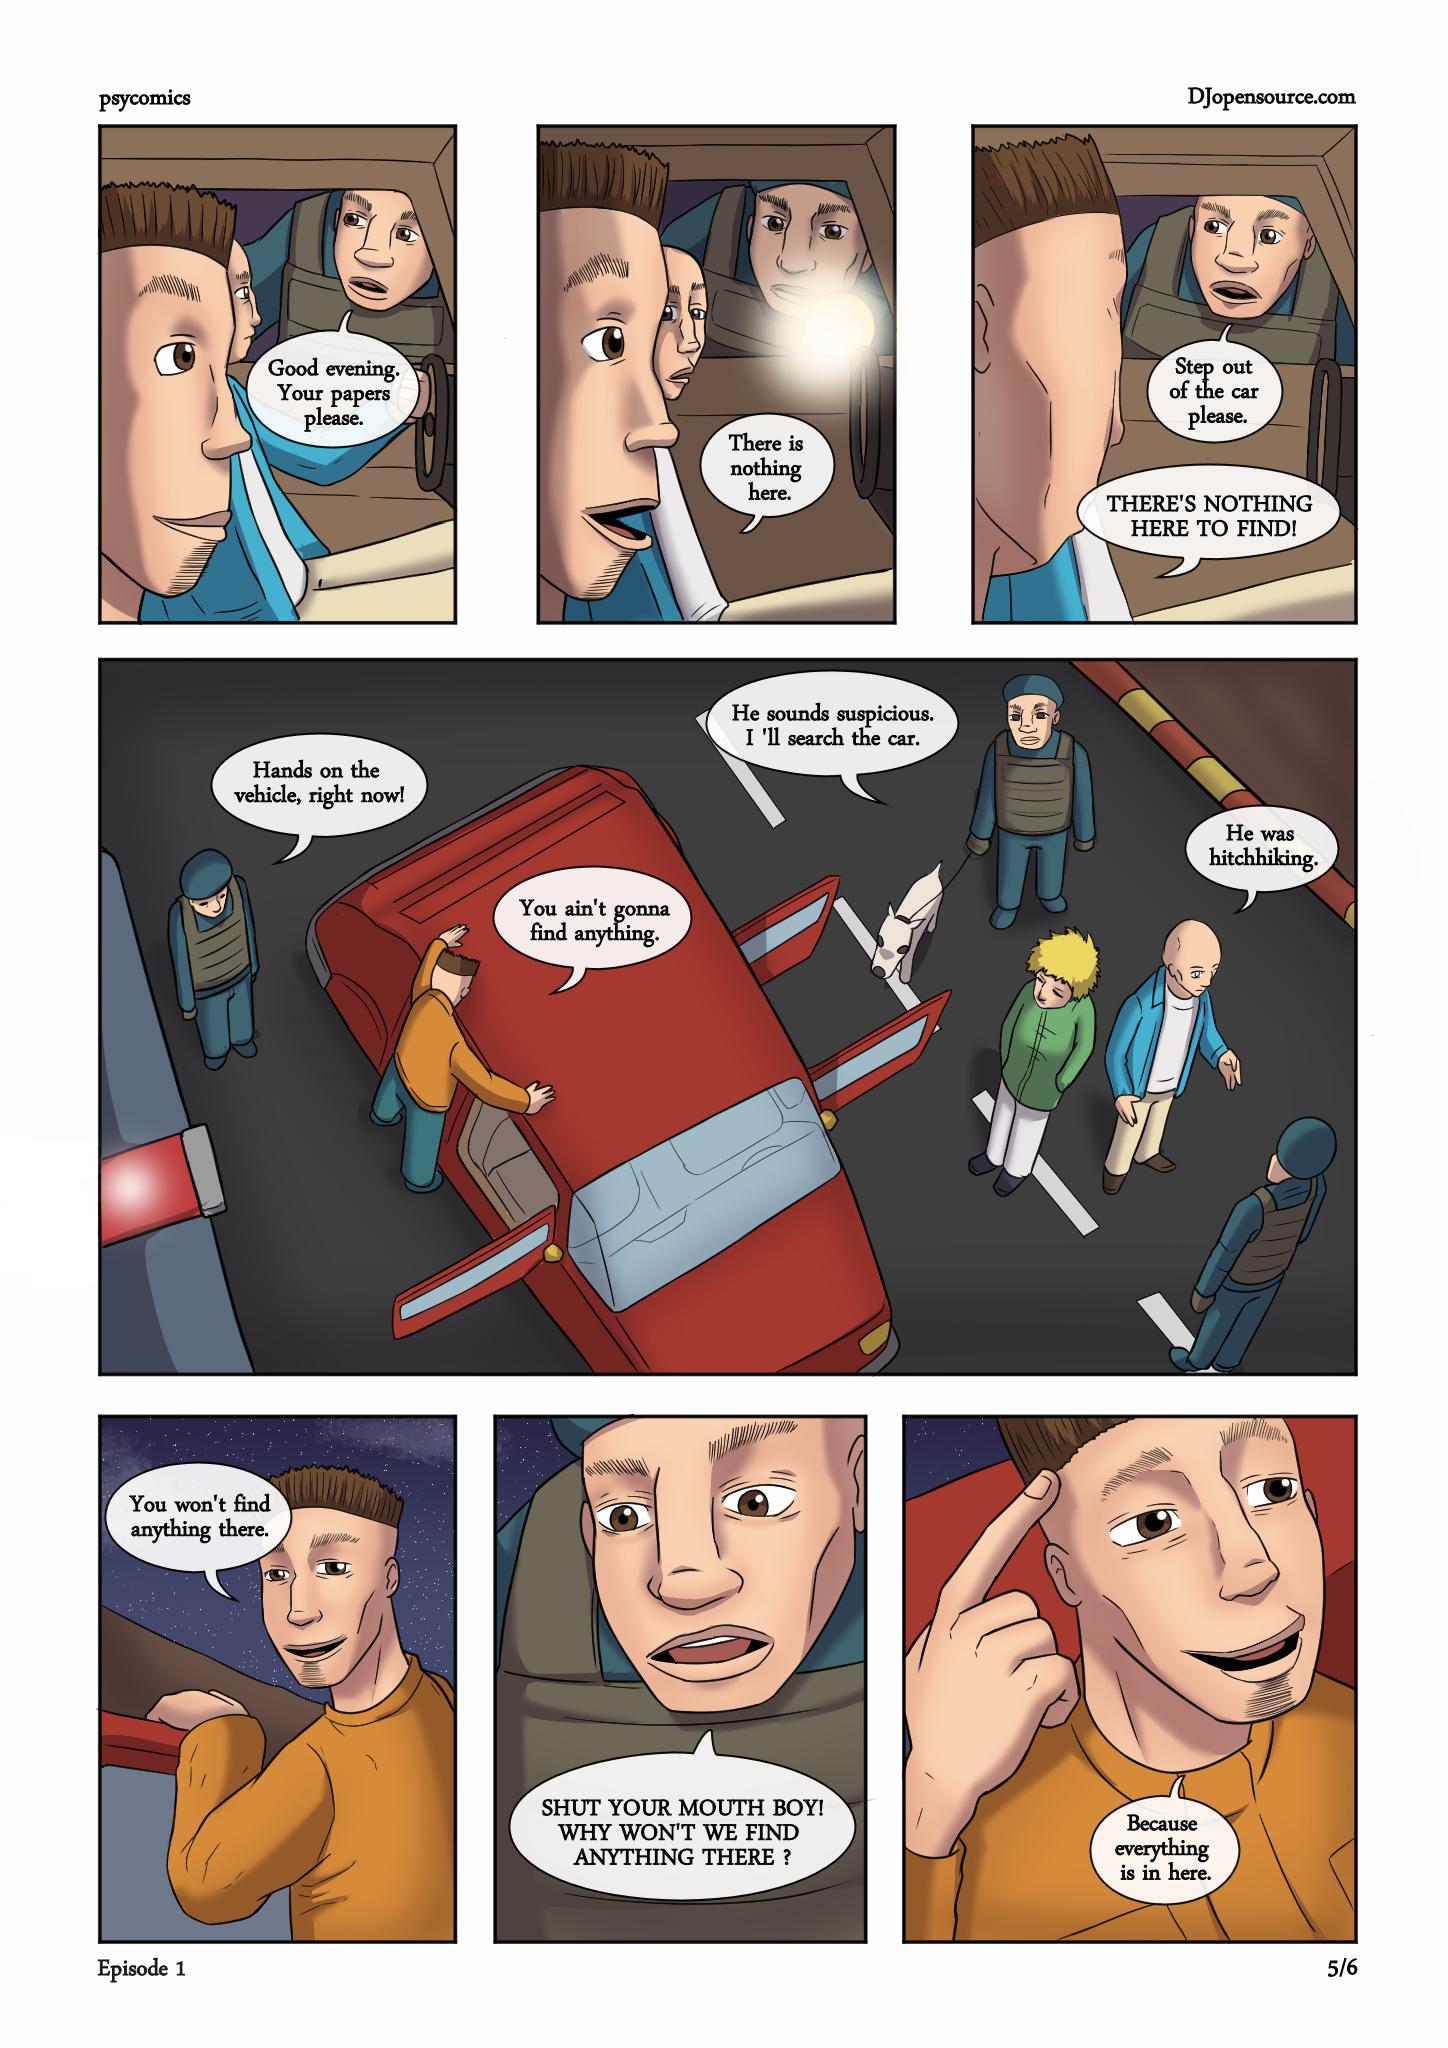 psycomics_episode_1_page_5.jpg